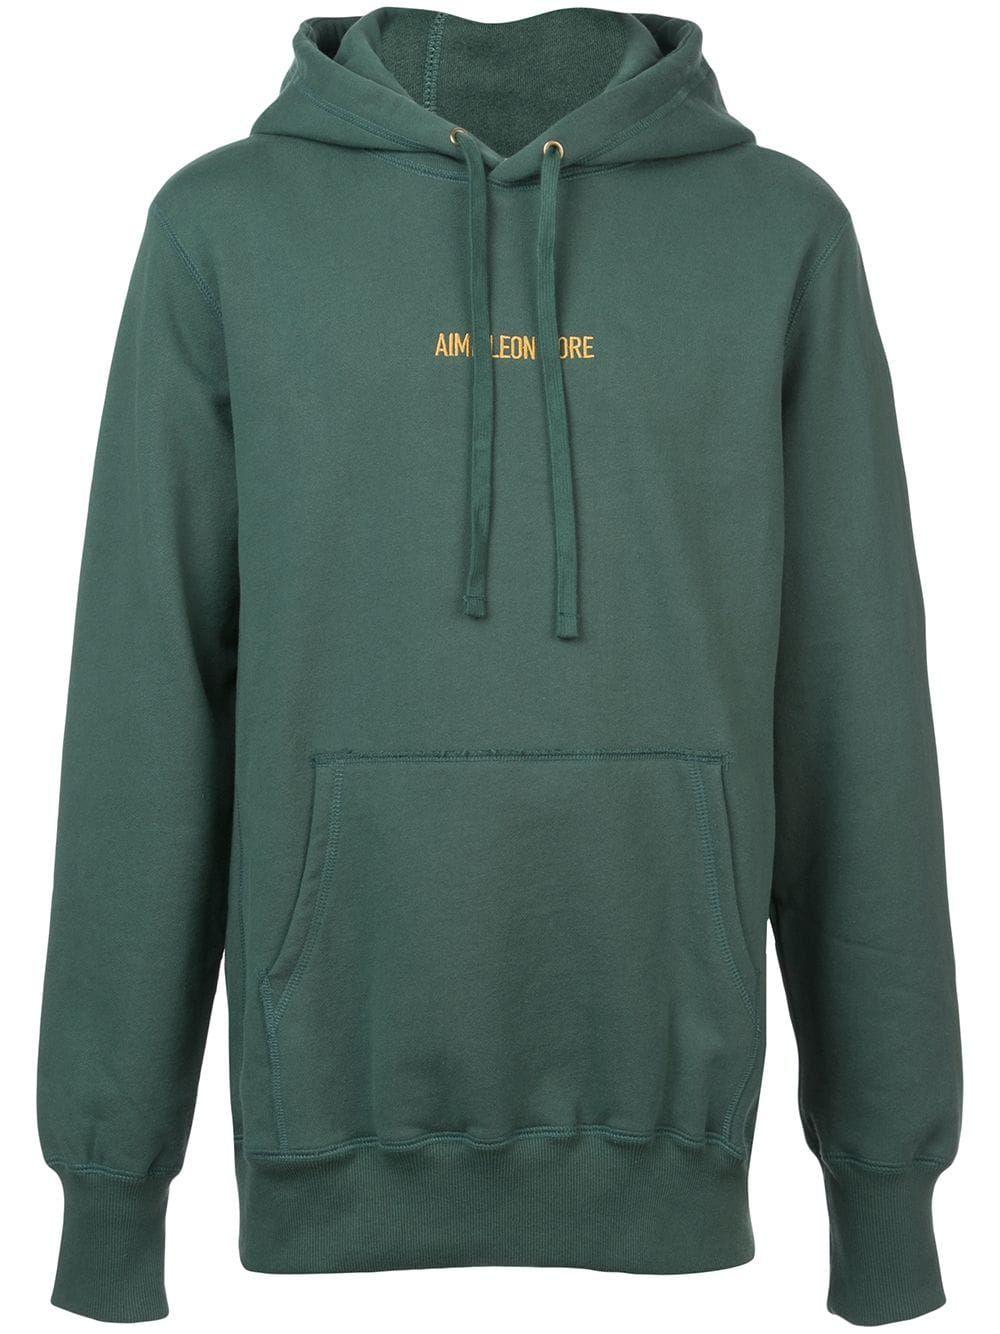 1b0958c55a AIMÉ LEON DORE AIMÉ LEON DORE LOGO HOODIE - GREEN. #aiméleondore #cloth